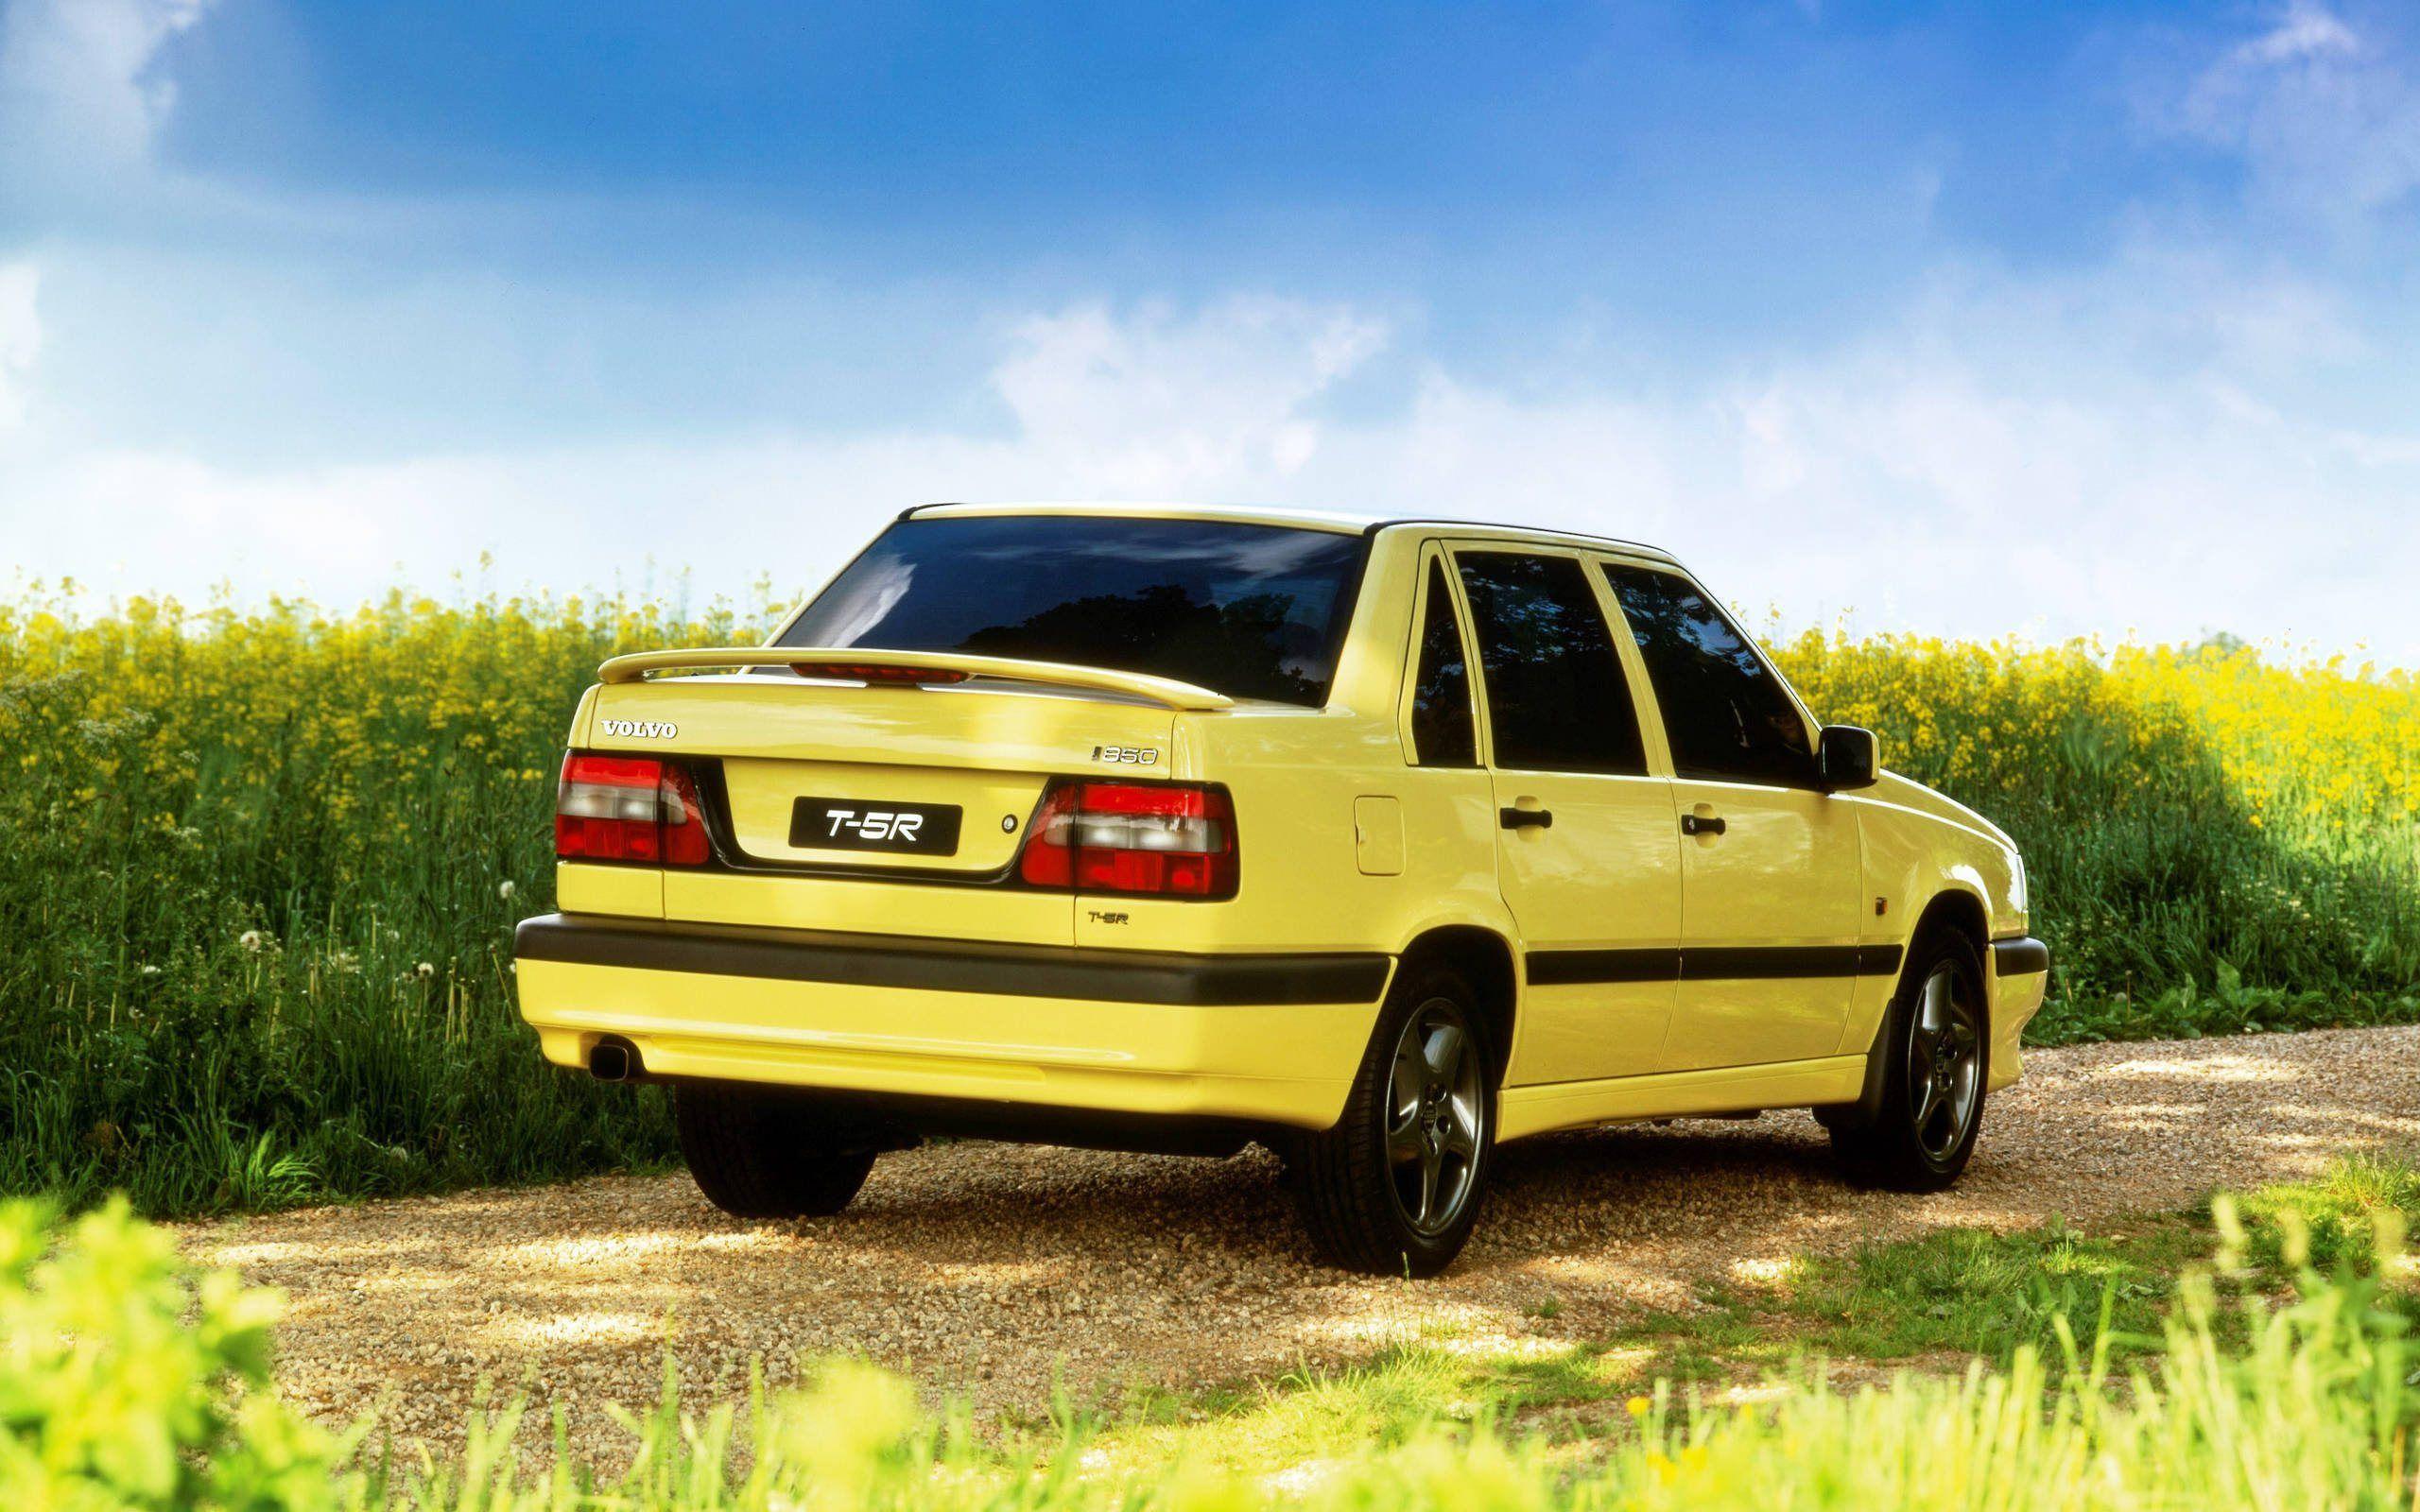 2021 Volvo Xc70 Wagon Ratings in 2020 | Volvo 850, Volvo